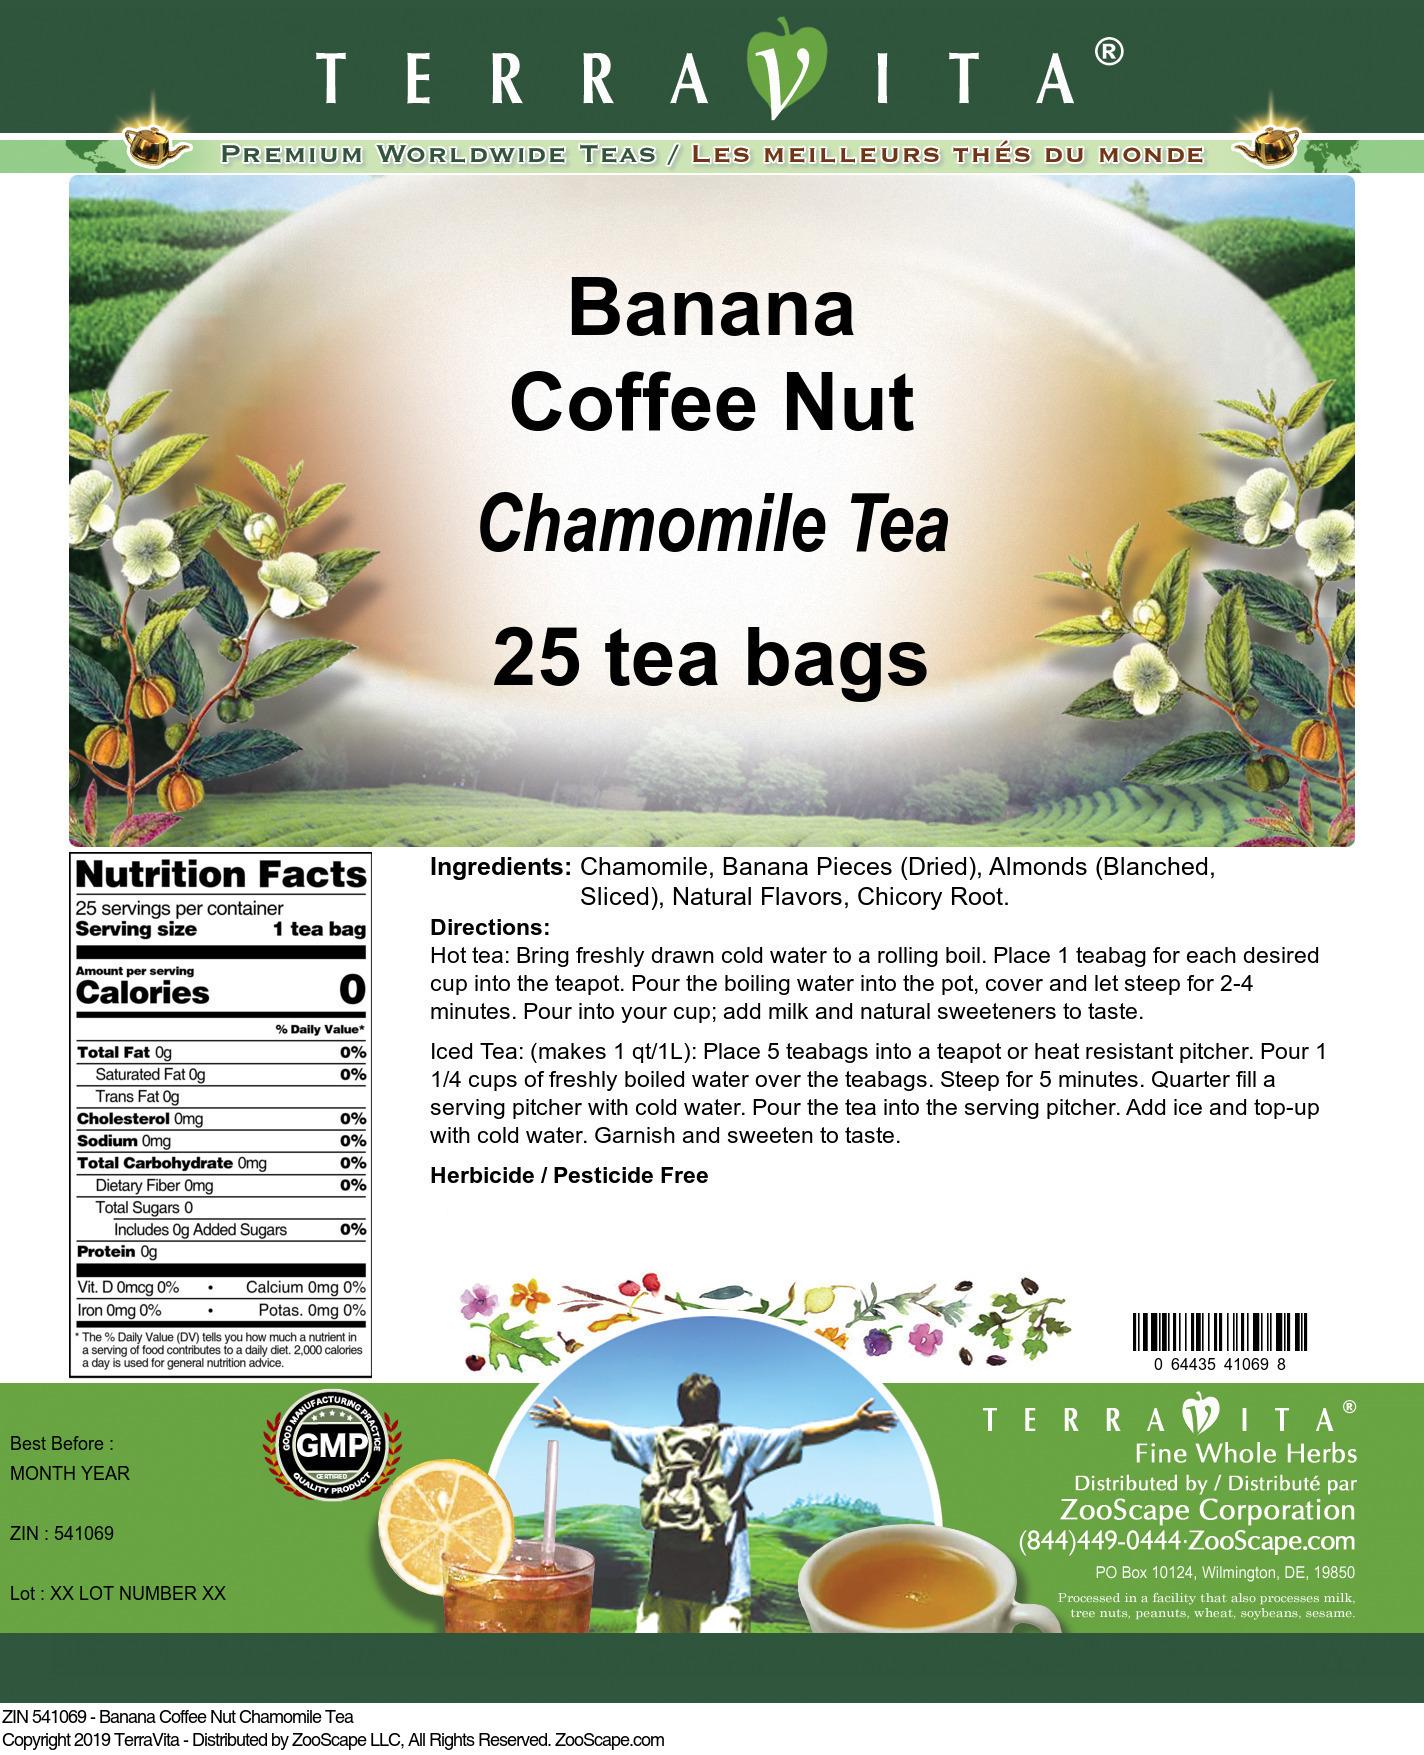 Banana Coffee Nut Chamomile Tea